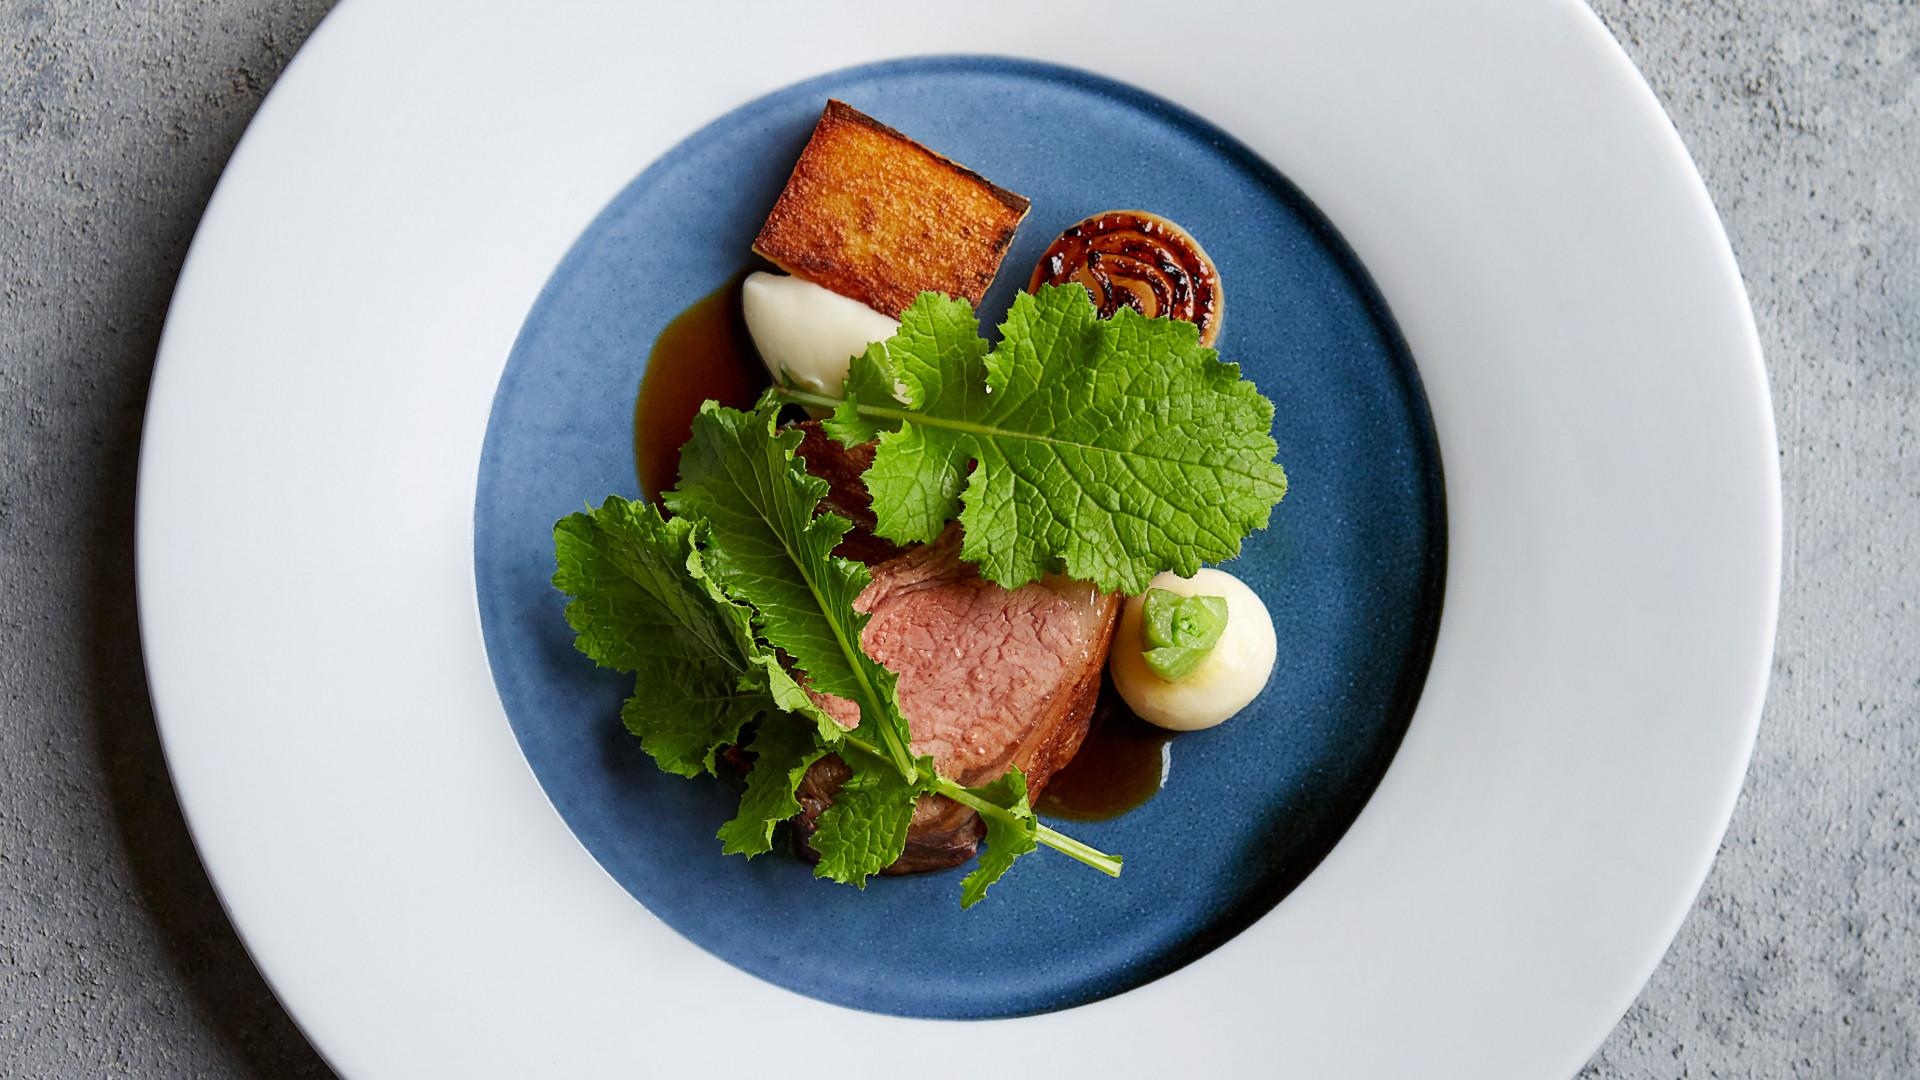 Lamb, turnips and onion